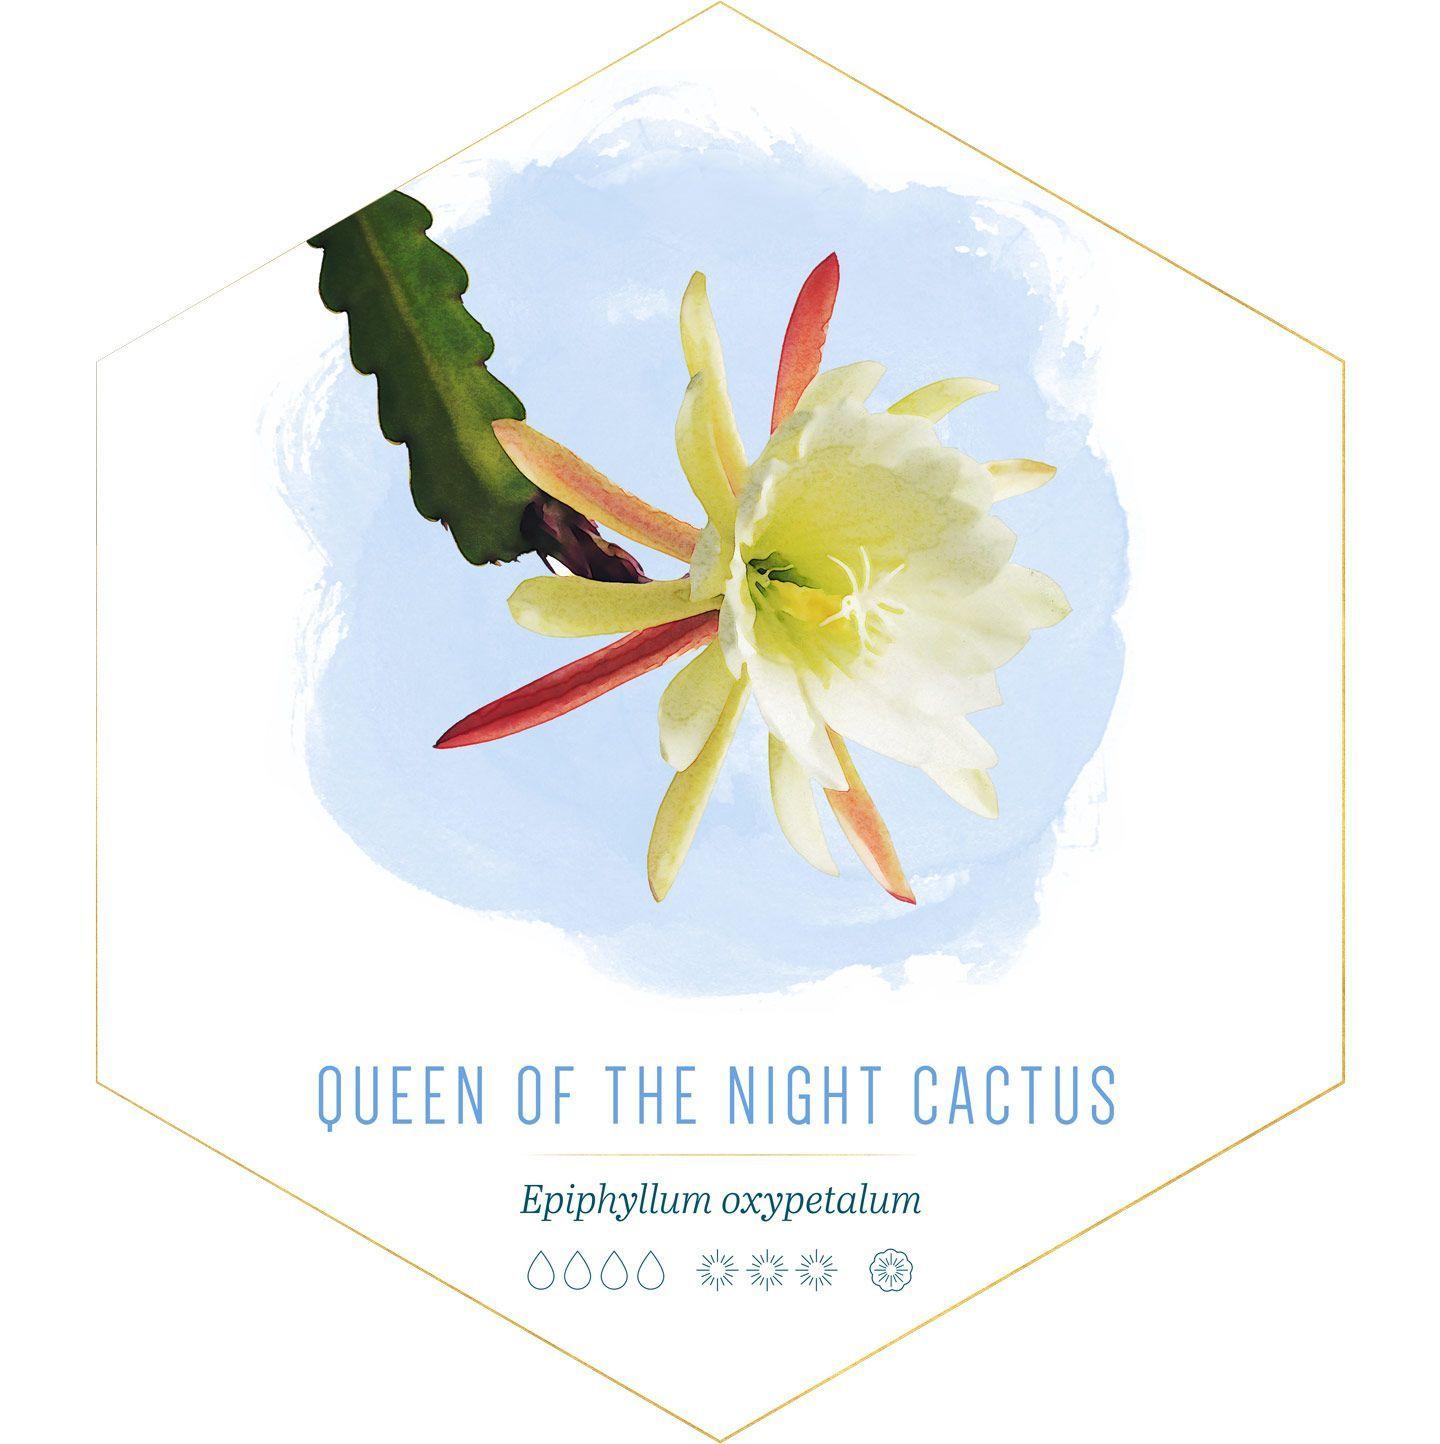 14 Jenis Tanaman Kaktus Hias untuk di Dalam Rumah